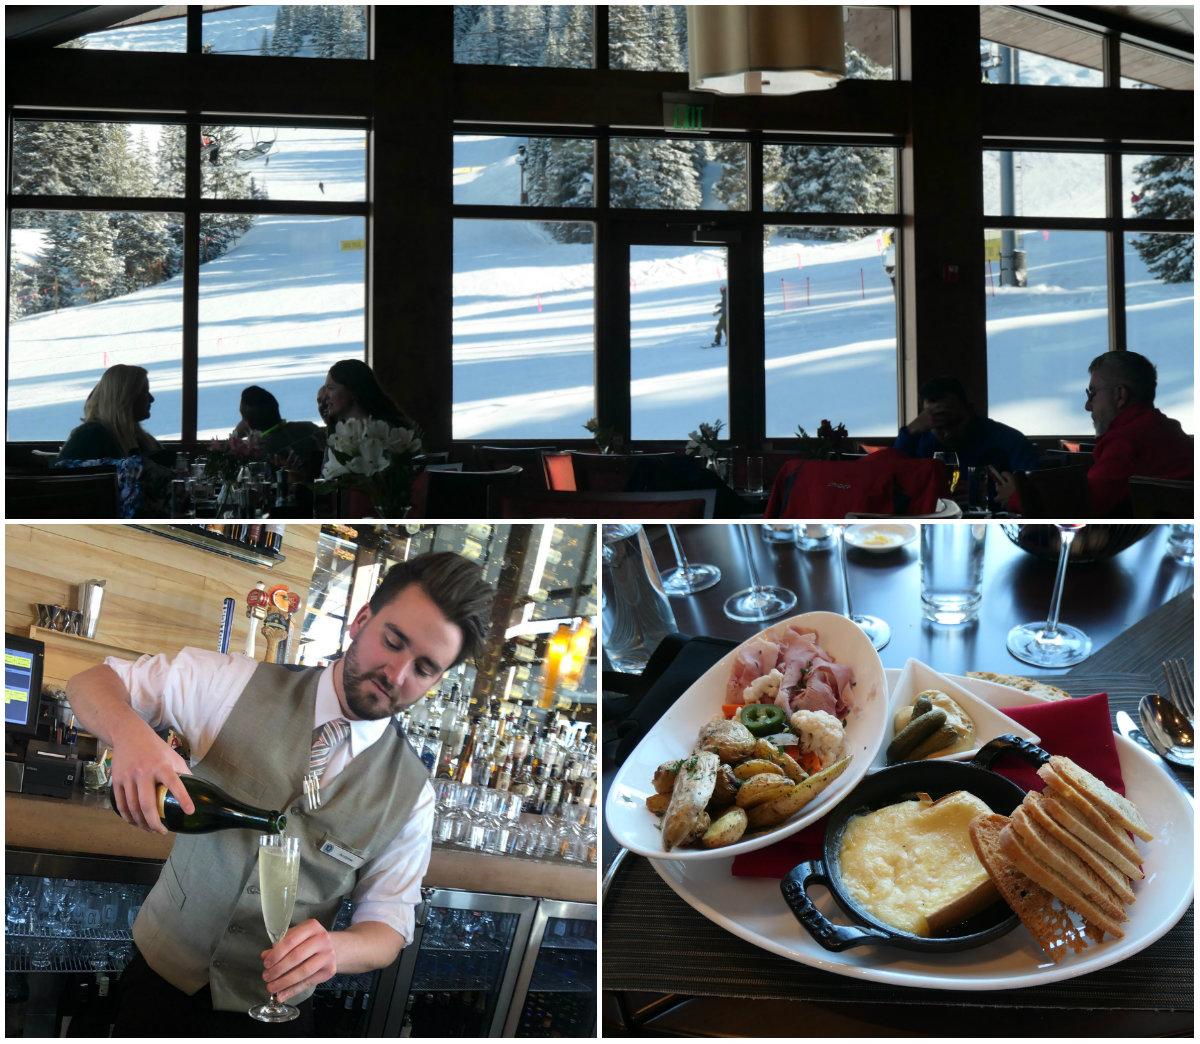 10th Restaurant op de piste van Vail Colorado